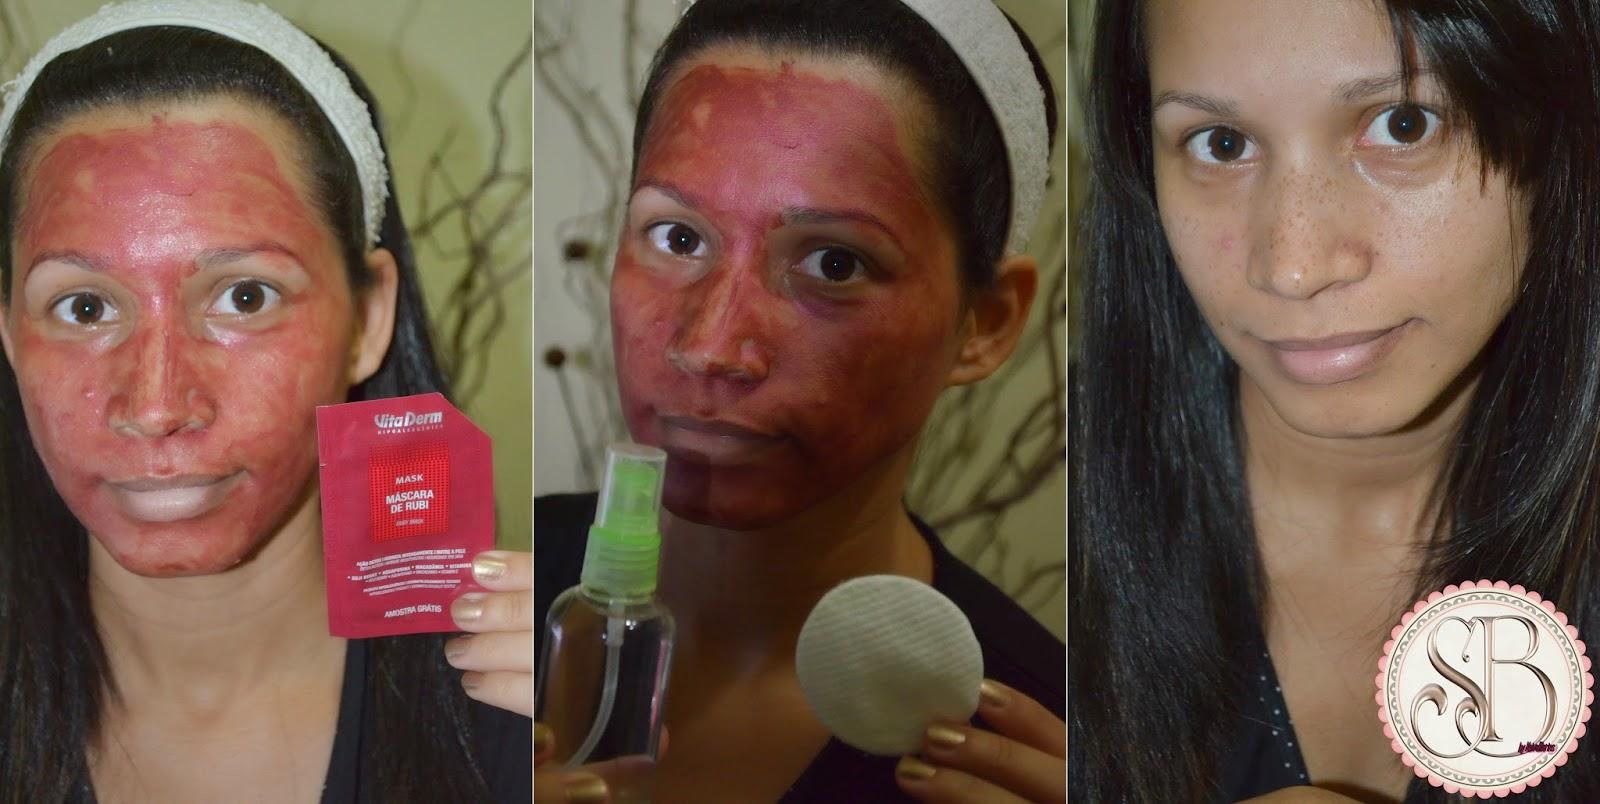 Somando Beleza, Neiva Marins, Vitaderm, Desiré, Niterói